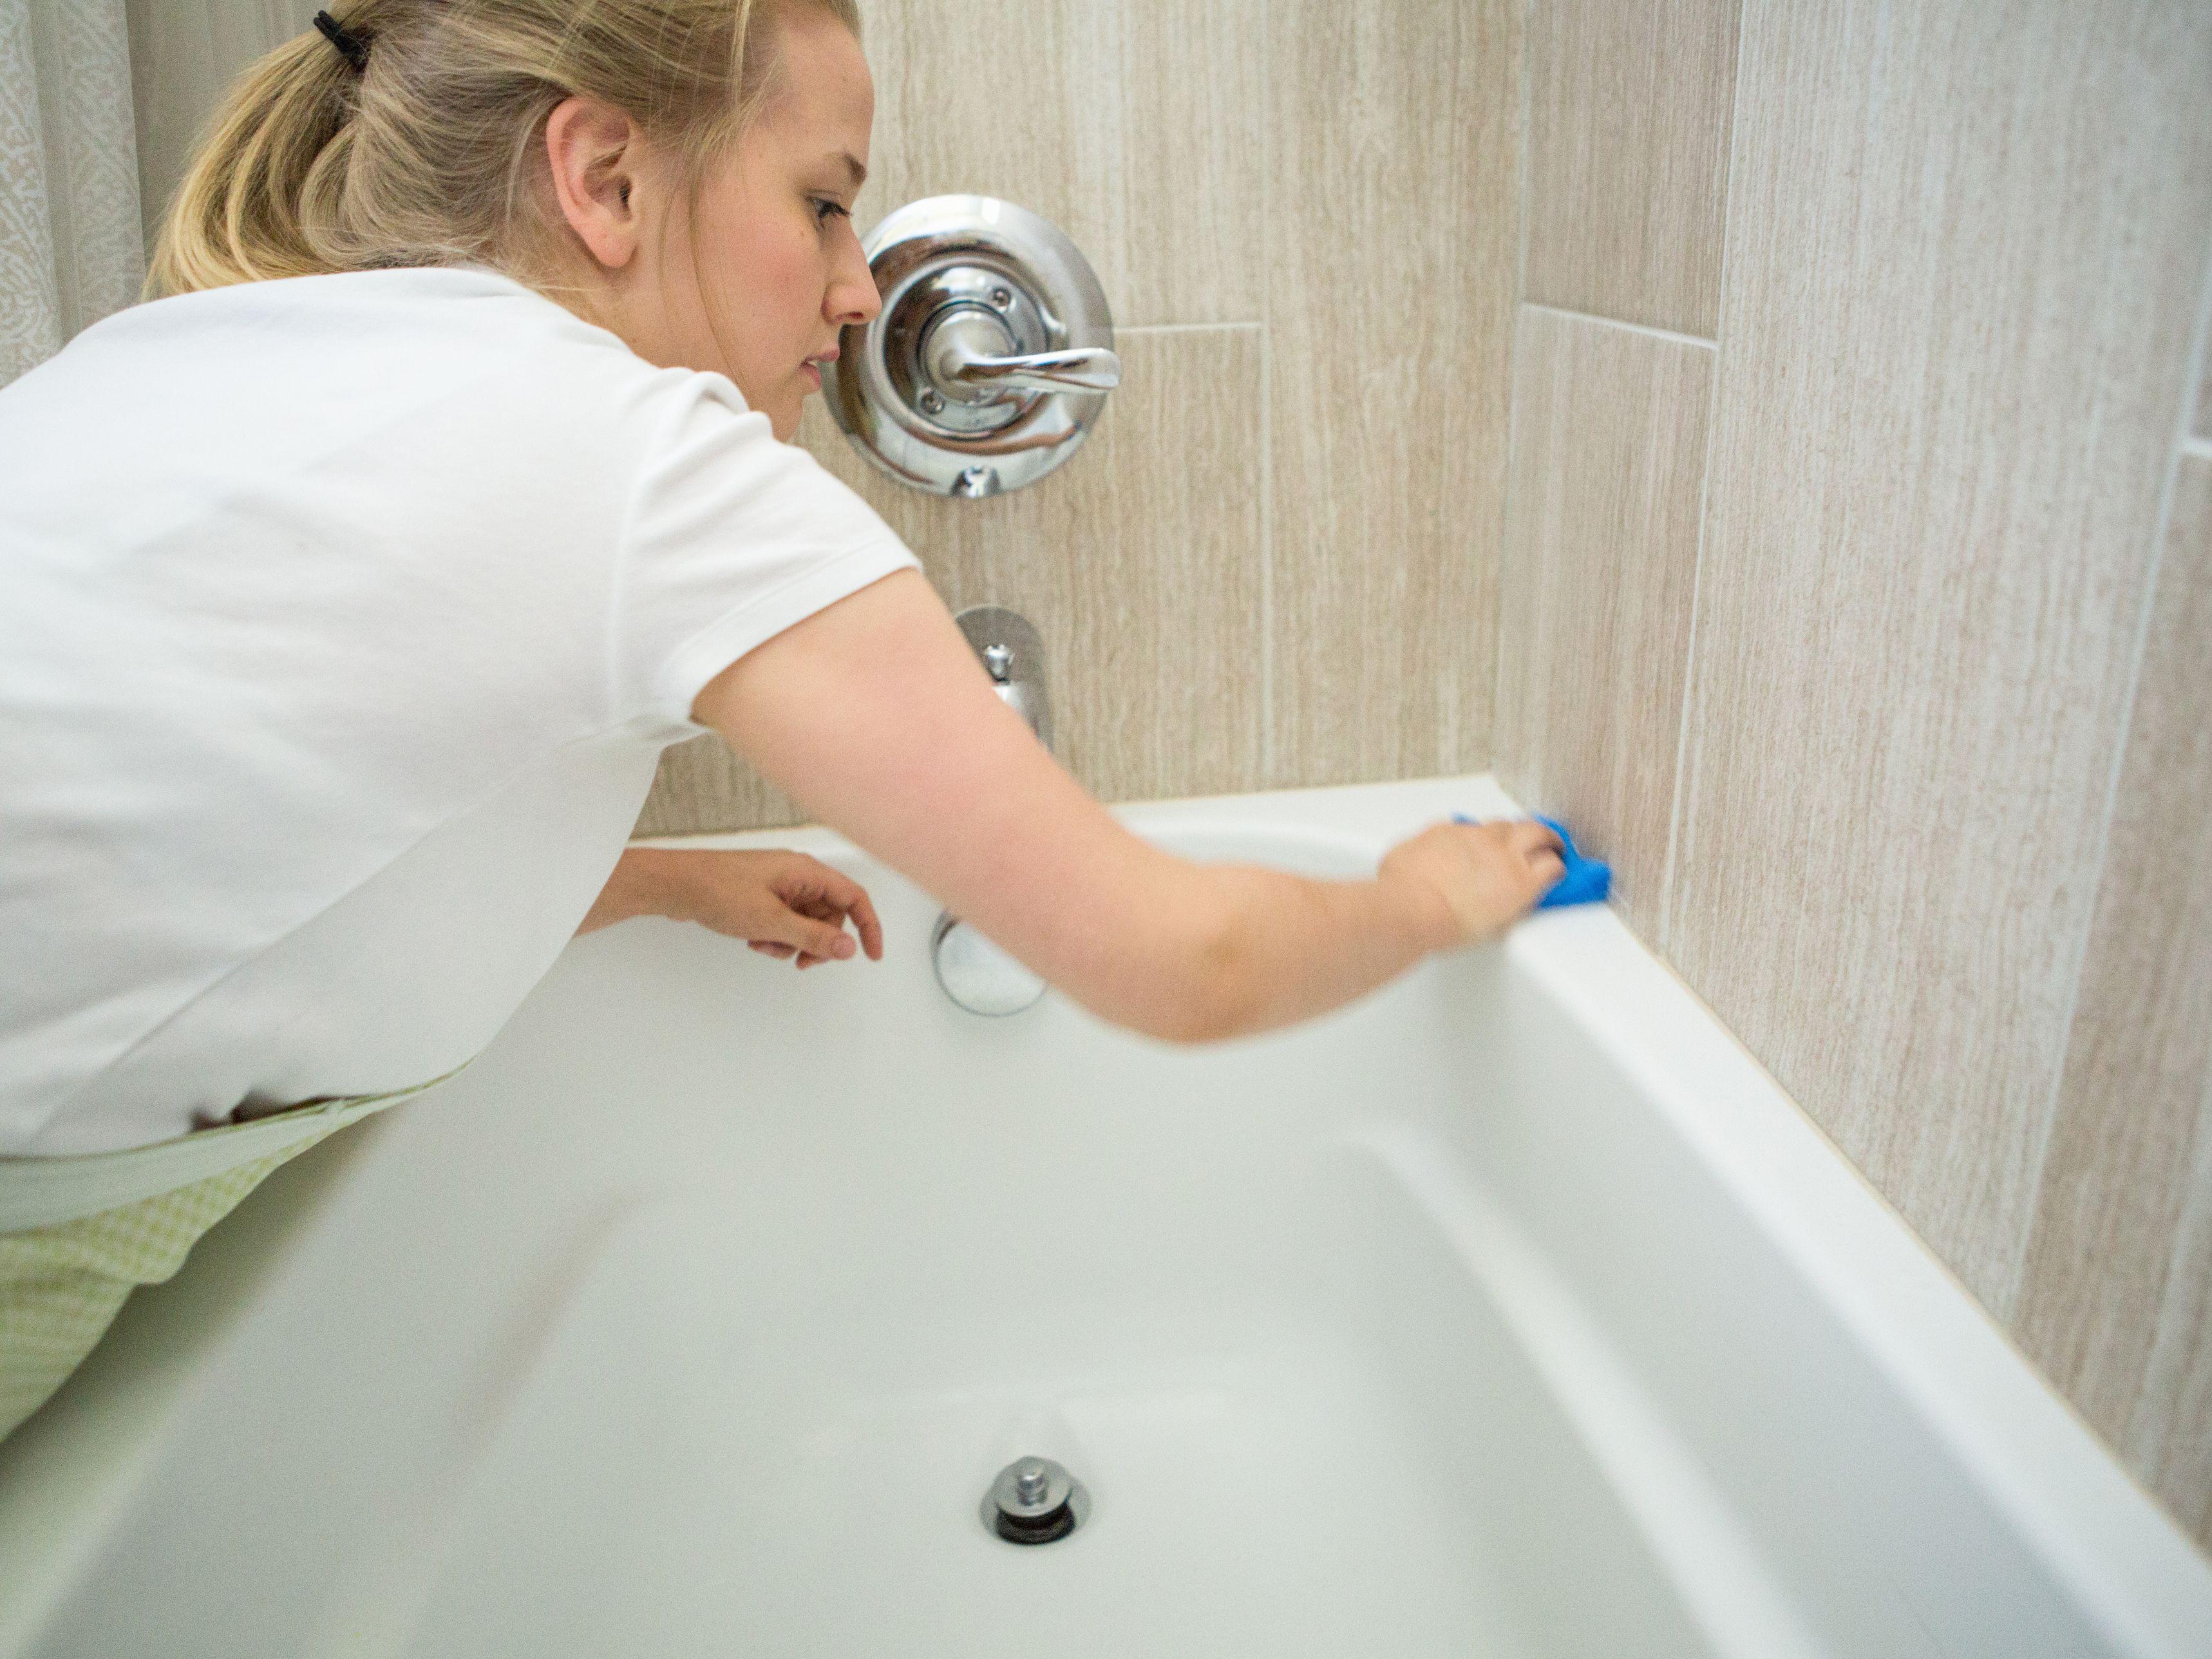 How To Clean A Reglazed Or Refinished Bathtub